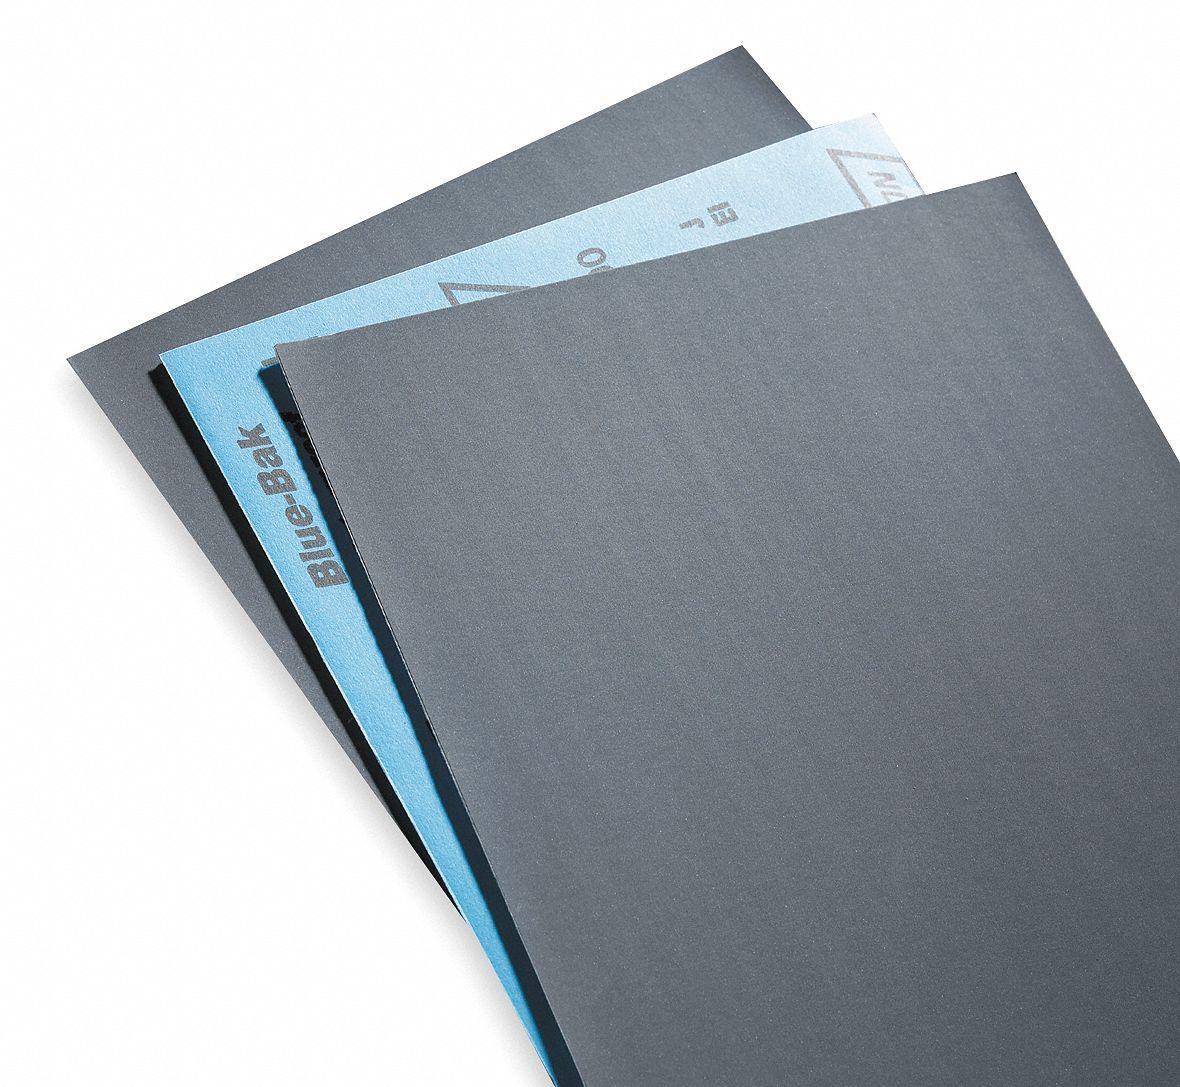 100 pcs Norton A415 9 x 11 In No Fil Durite Silicon Carbide Sandpaper 320 grit